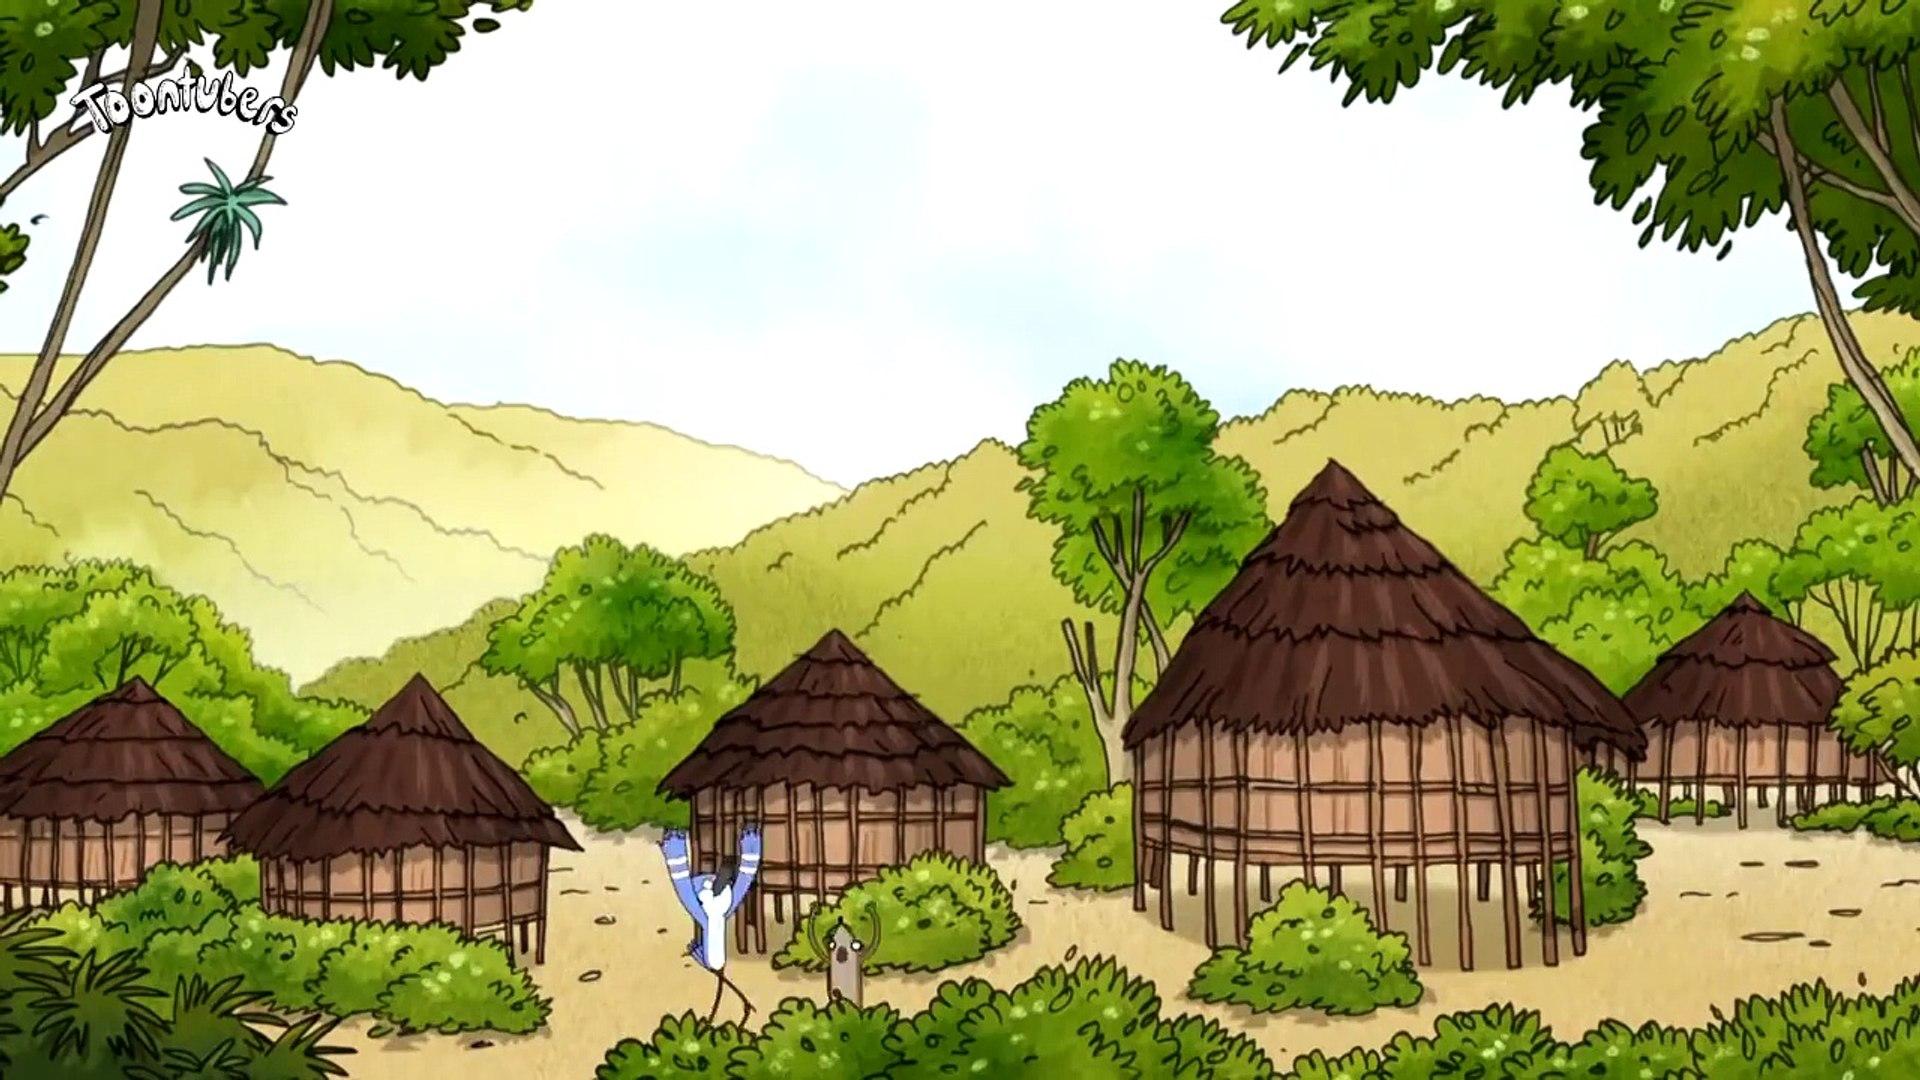 O MELHOR PRESENTE DE NATAL DO MUNDDDDOOOOOOOOHHHHH | Toontubers | Cartoon Netowork